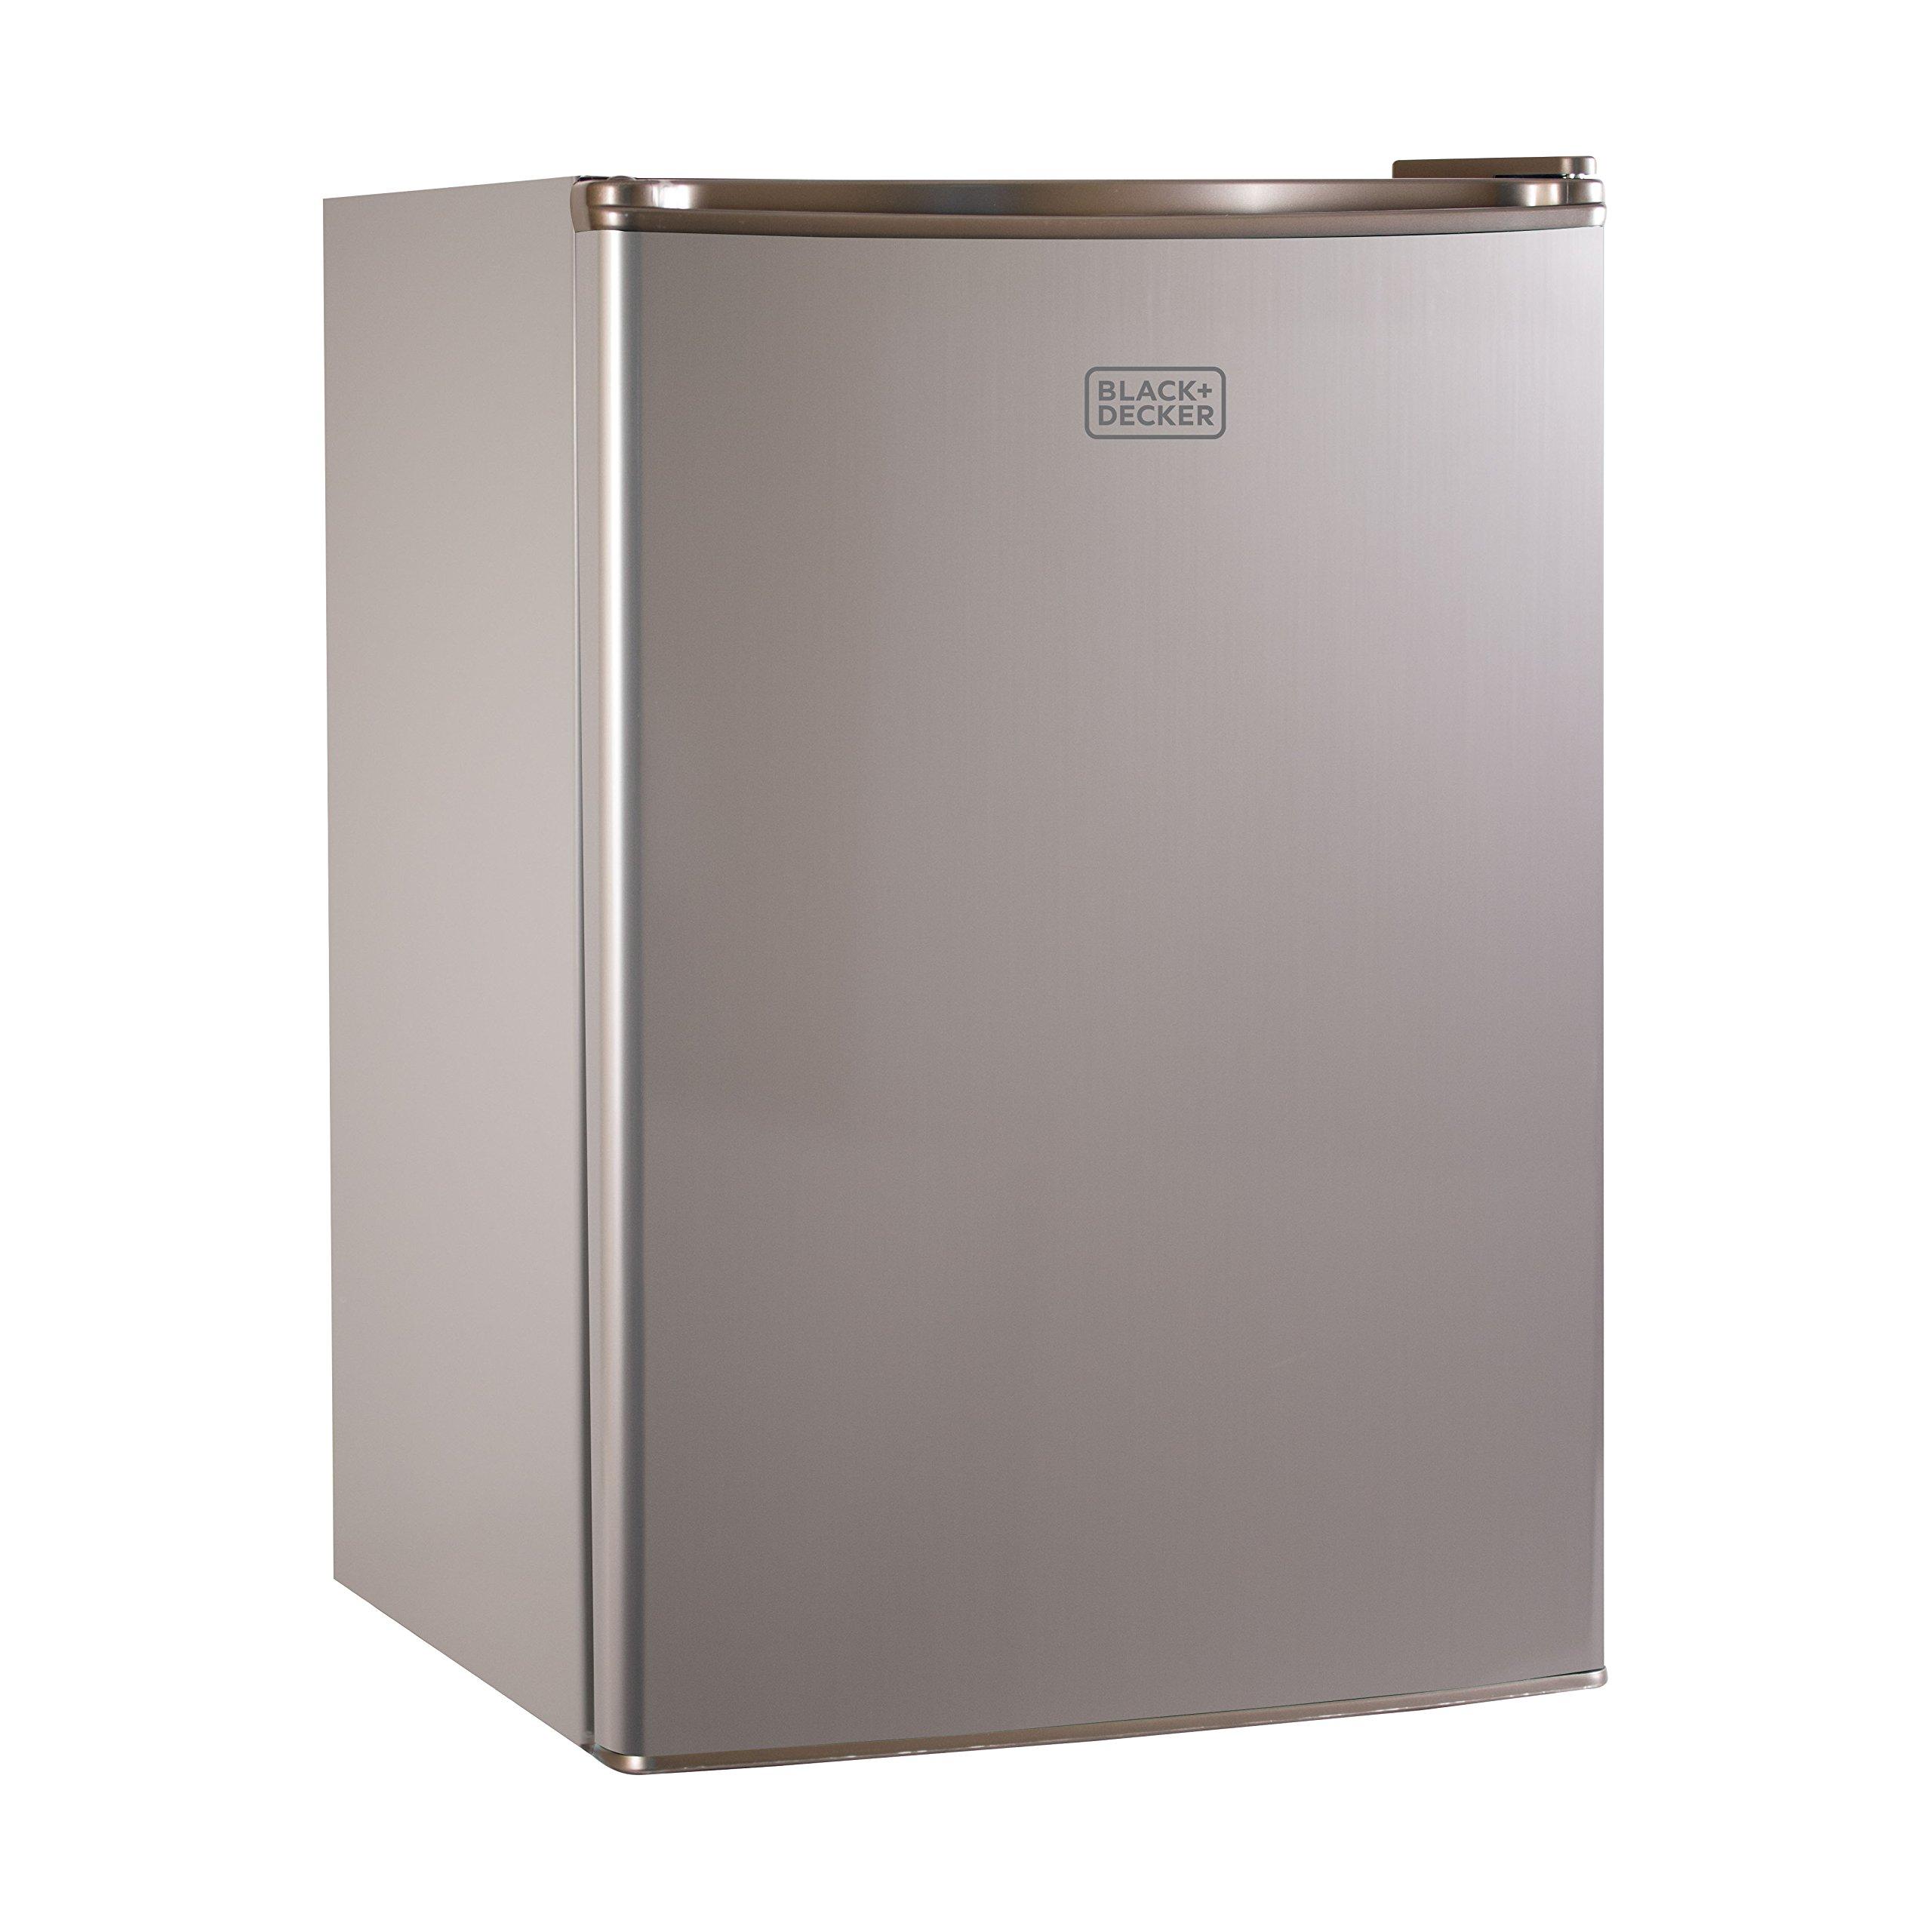 BLACK+DECKER BCRK25V Compact Refrigerator Energy Star Single Door Mini Fridge with Freezer, 2.5 Cubic Feet, VCM by BLACK+DECKER